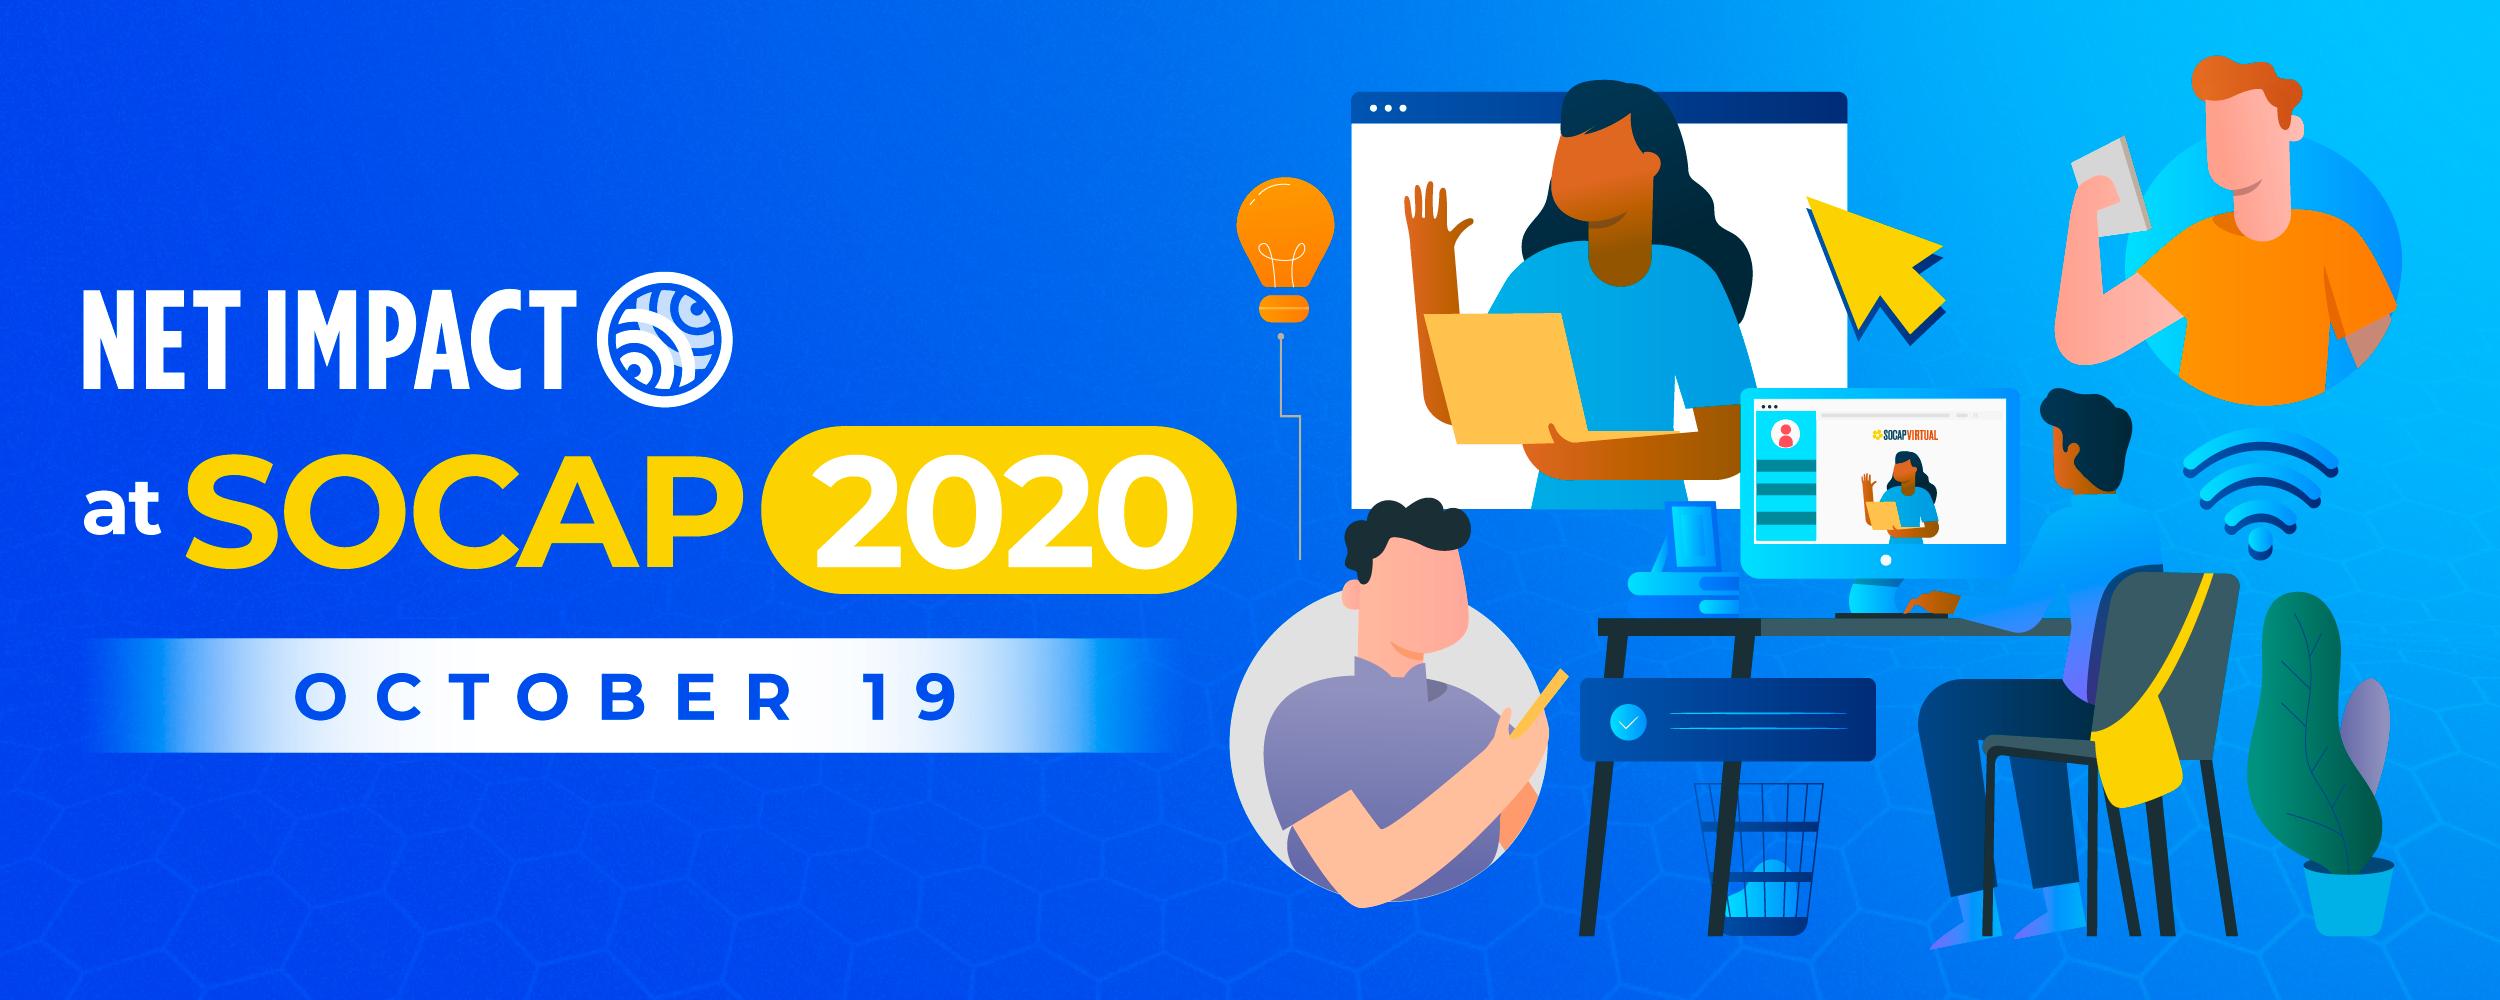 netimpact socap 2020